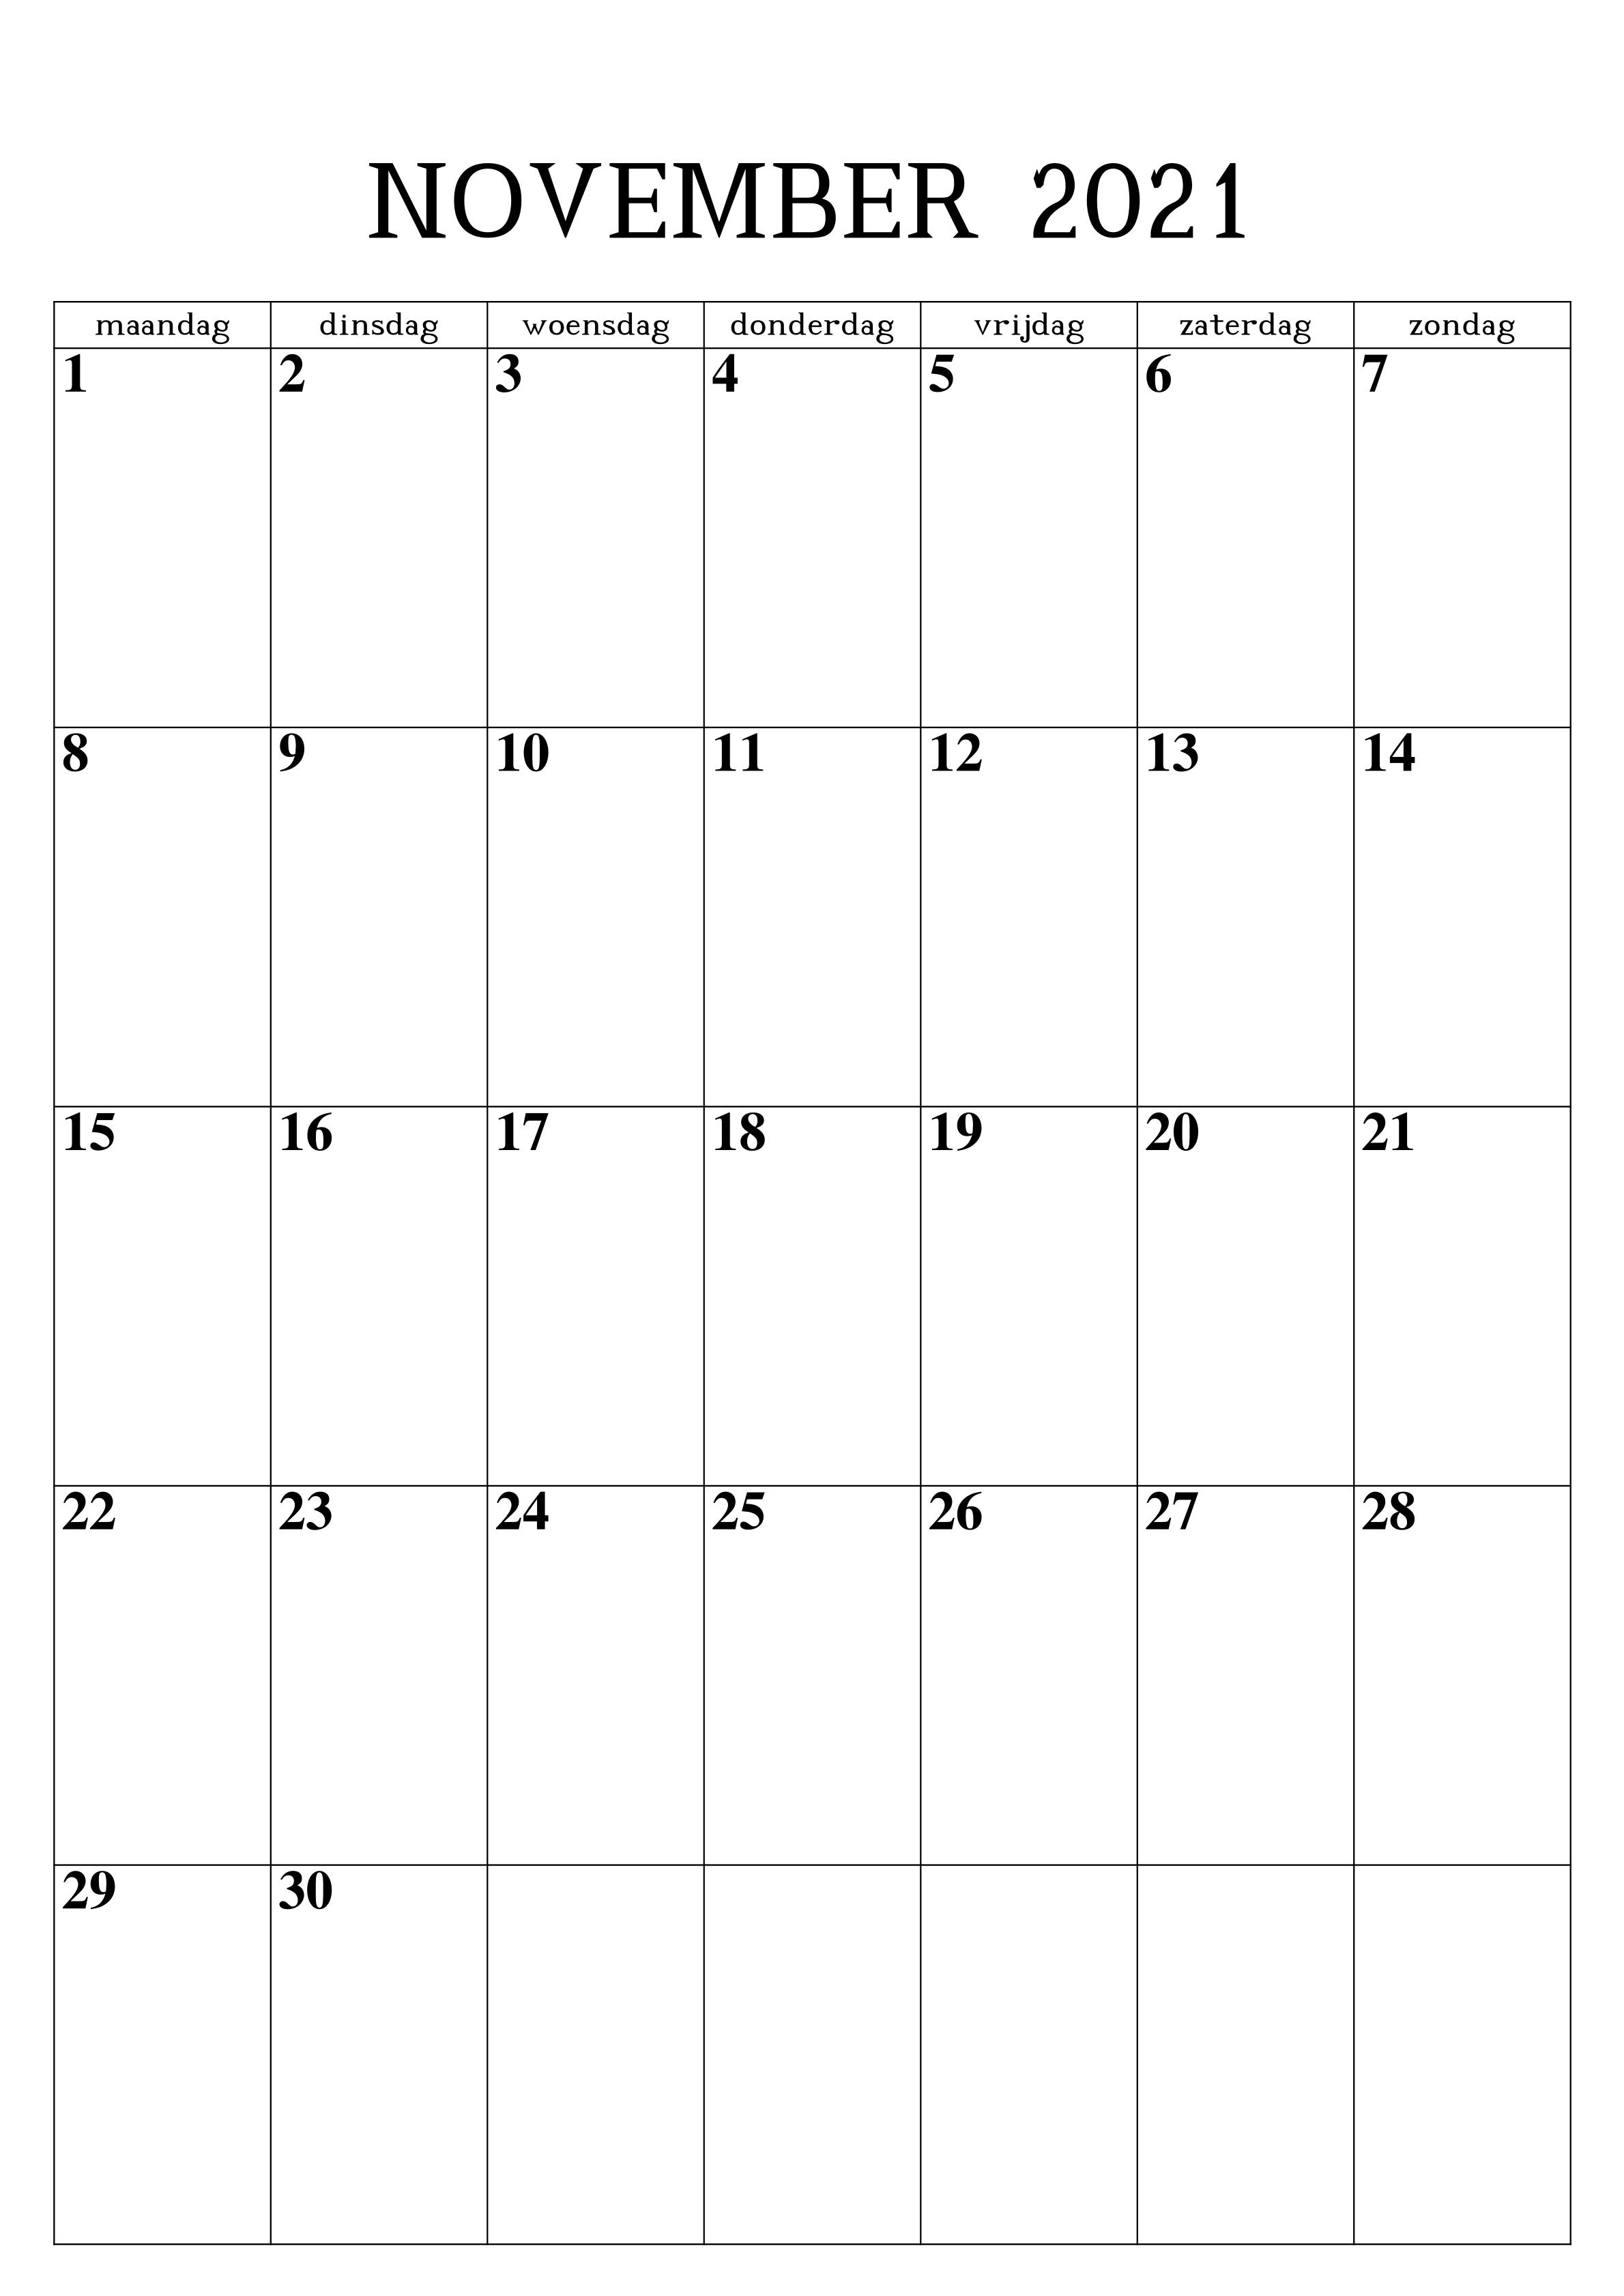 Monats November 2021 Kalender